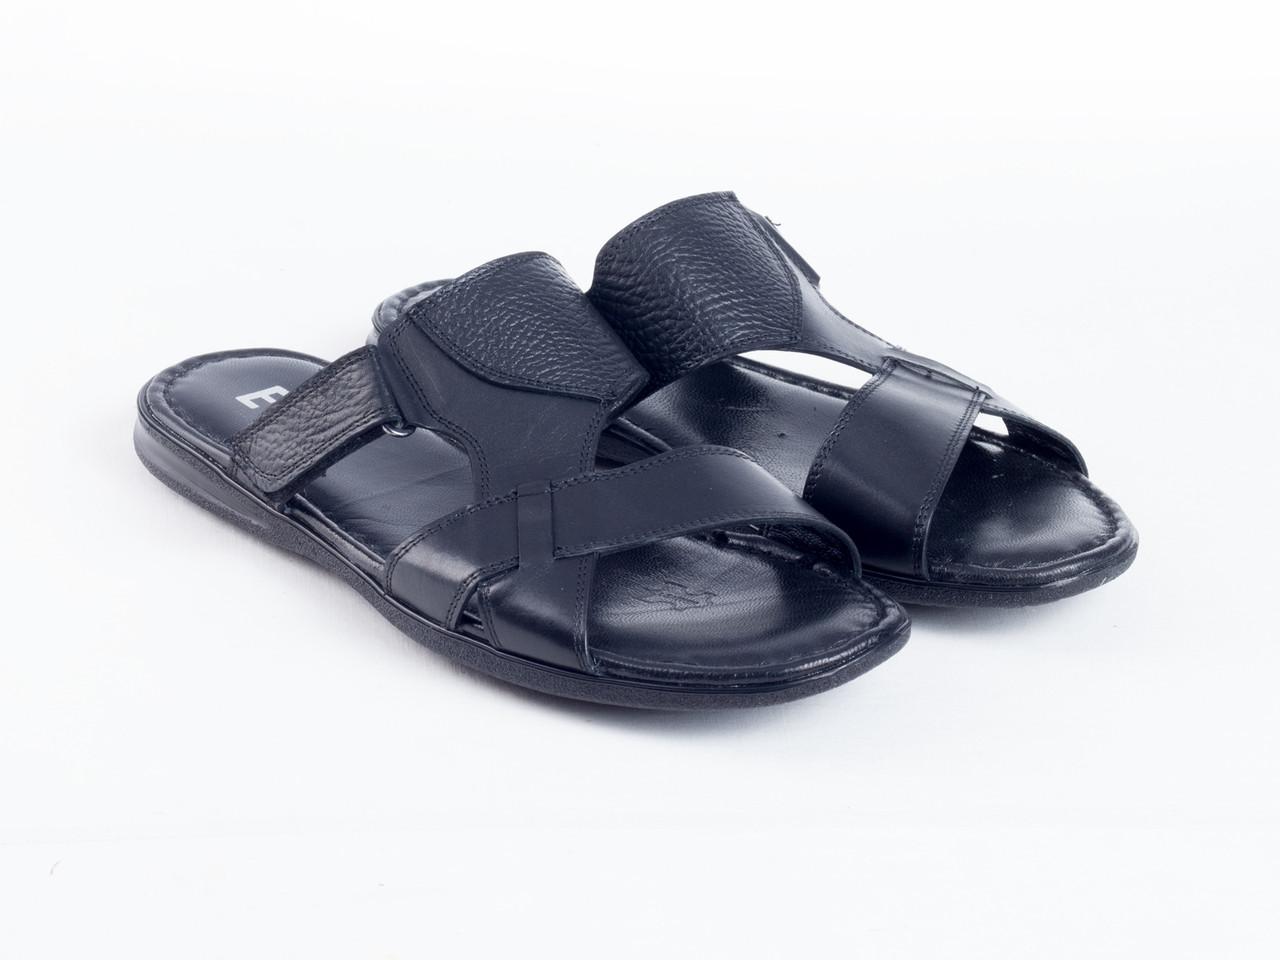 Шлепанцы Etor 503-3514-7028 черные, фото 1